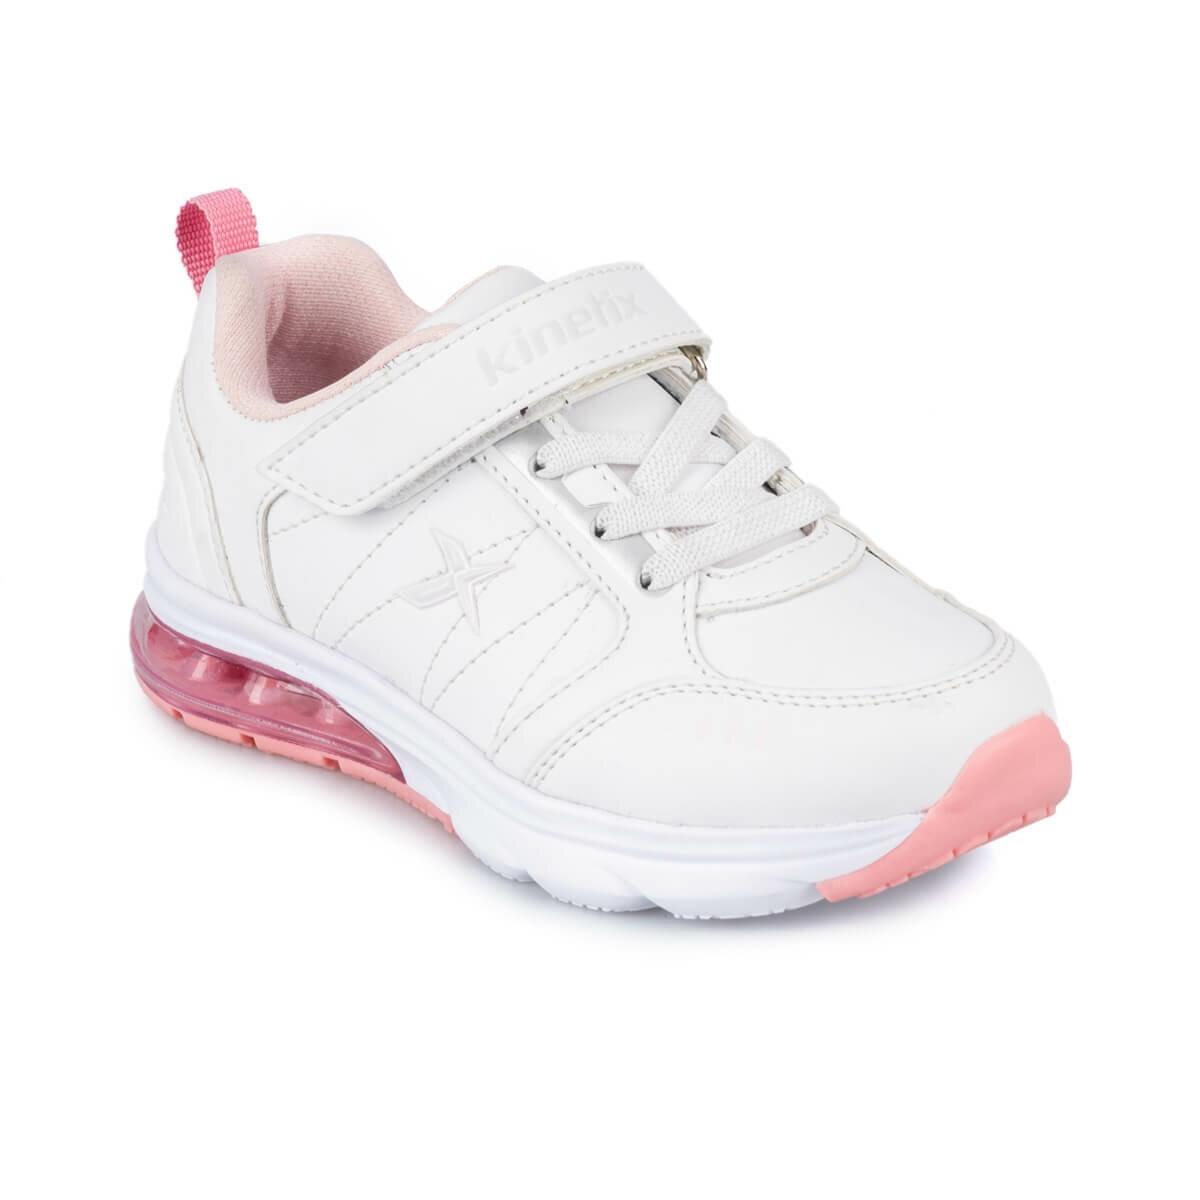 FLO SPURSY 9PR White Female Child Running Shoes KINETIX